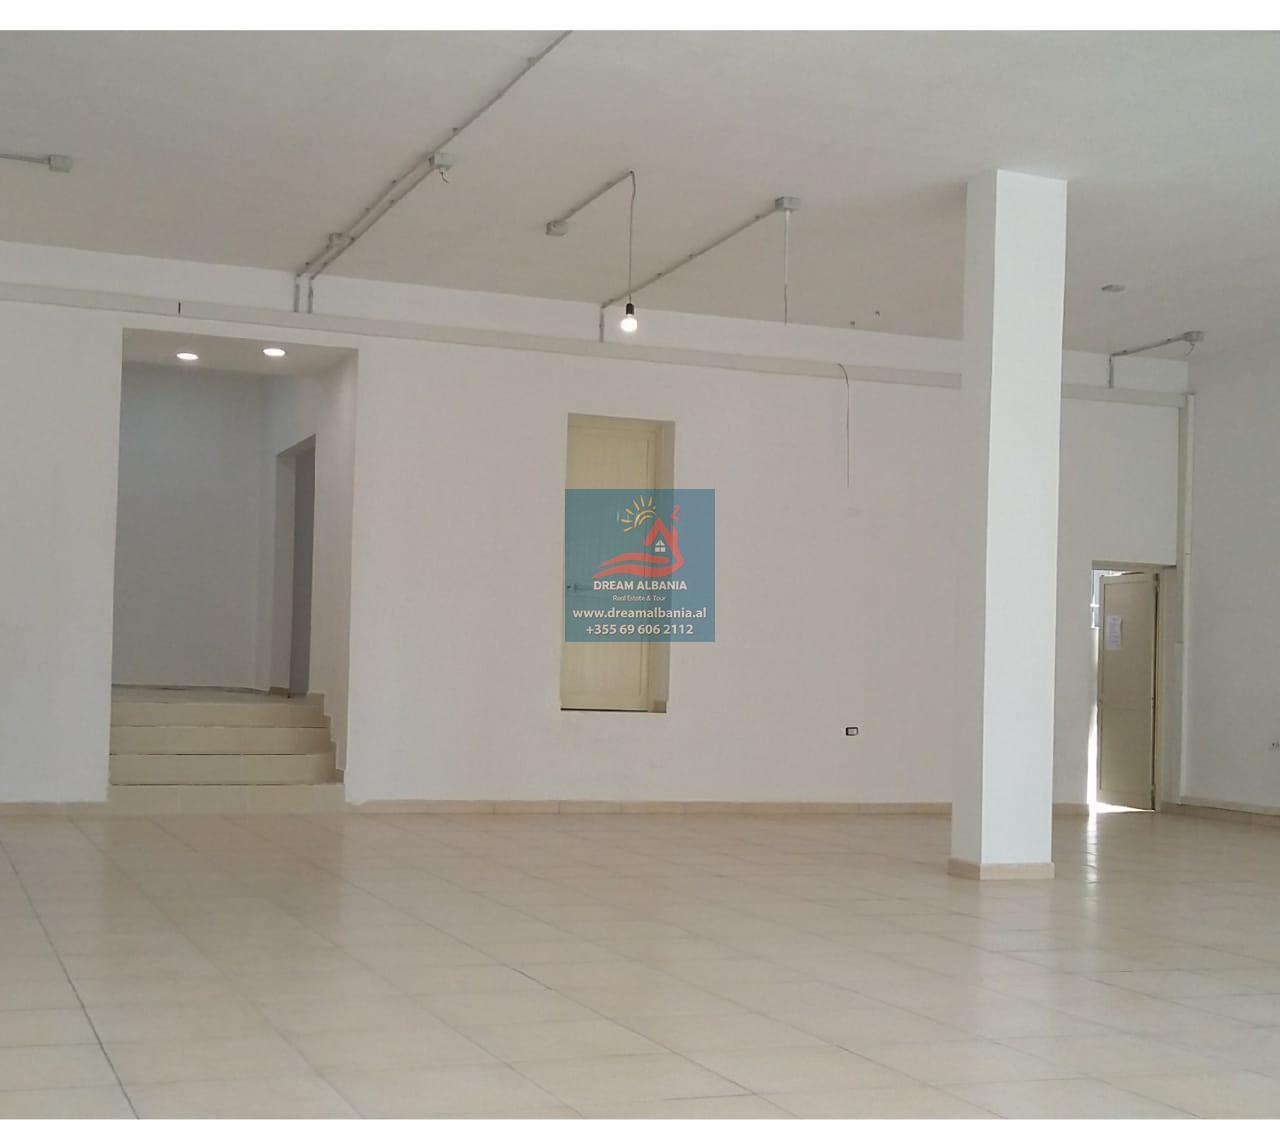 Dyqan me qera Prane Pazarit te Ri rruga Avni Rustemi ne Tirane(ID 4271385)